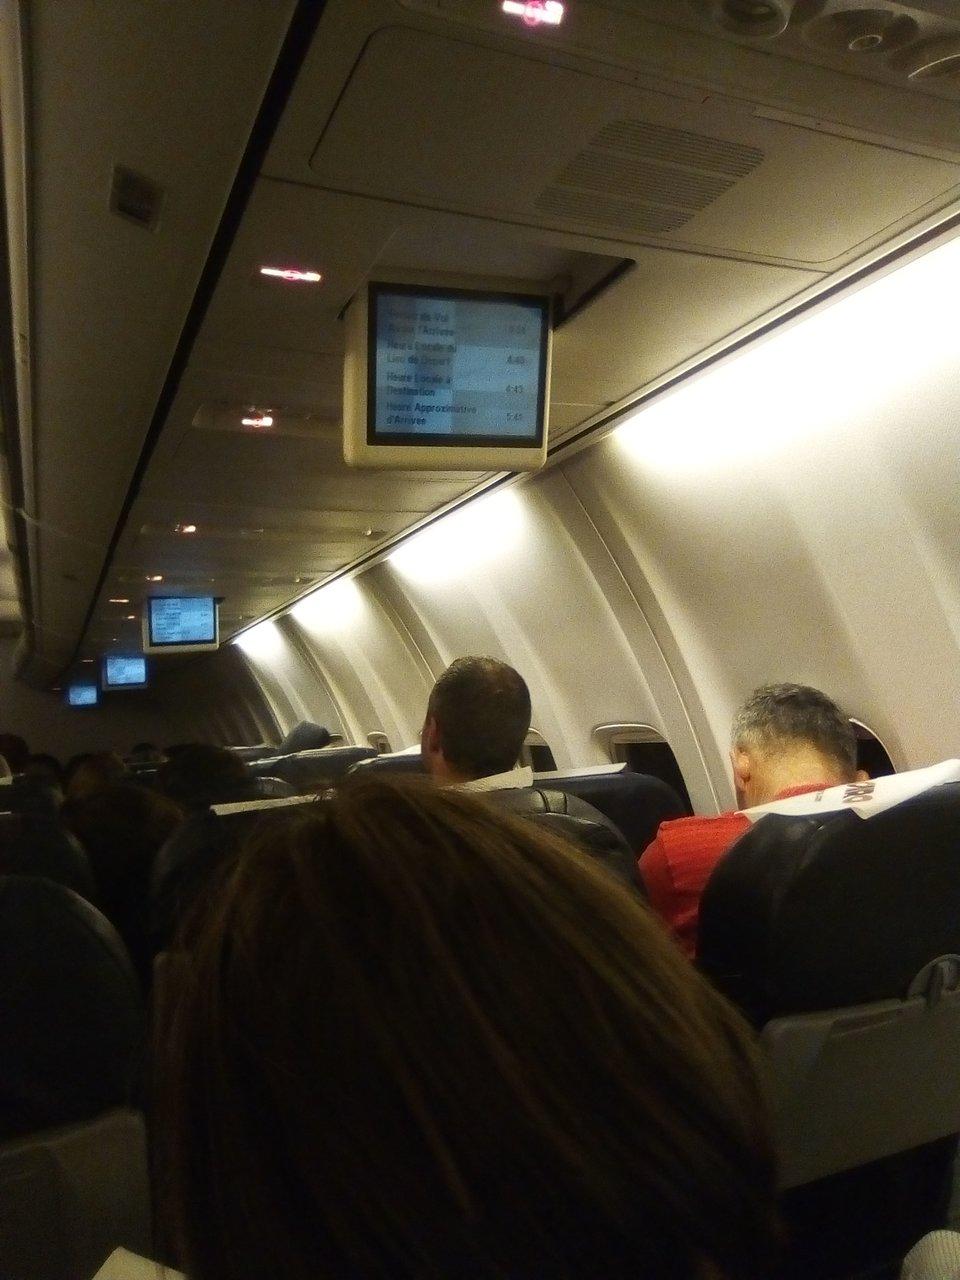 70c86a5eb6df Air Cairo Flights and Reviews (with photos) - TripAdvisor